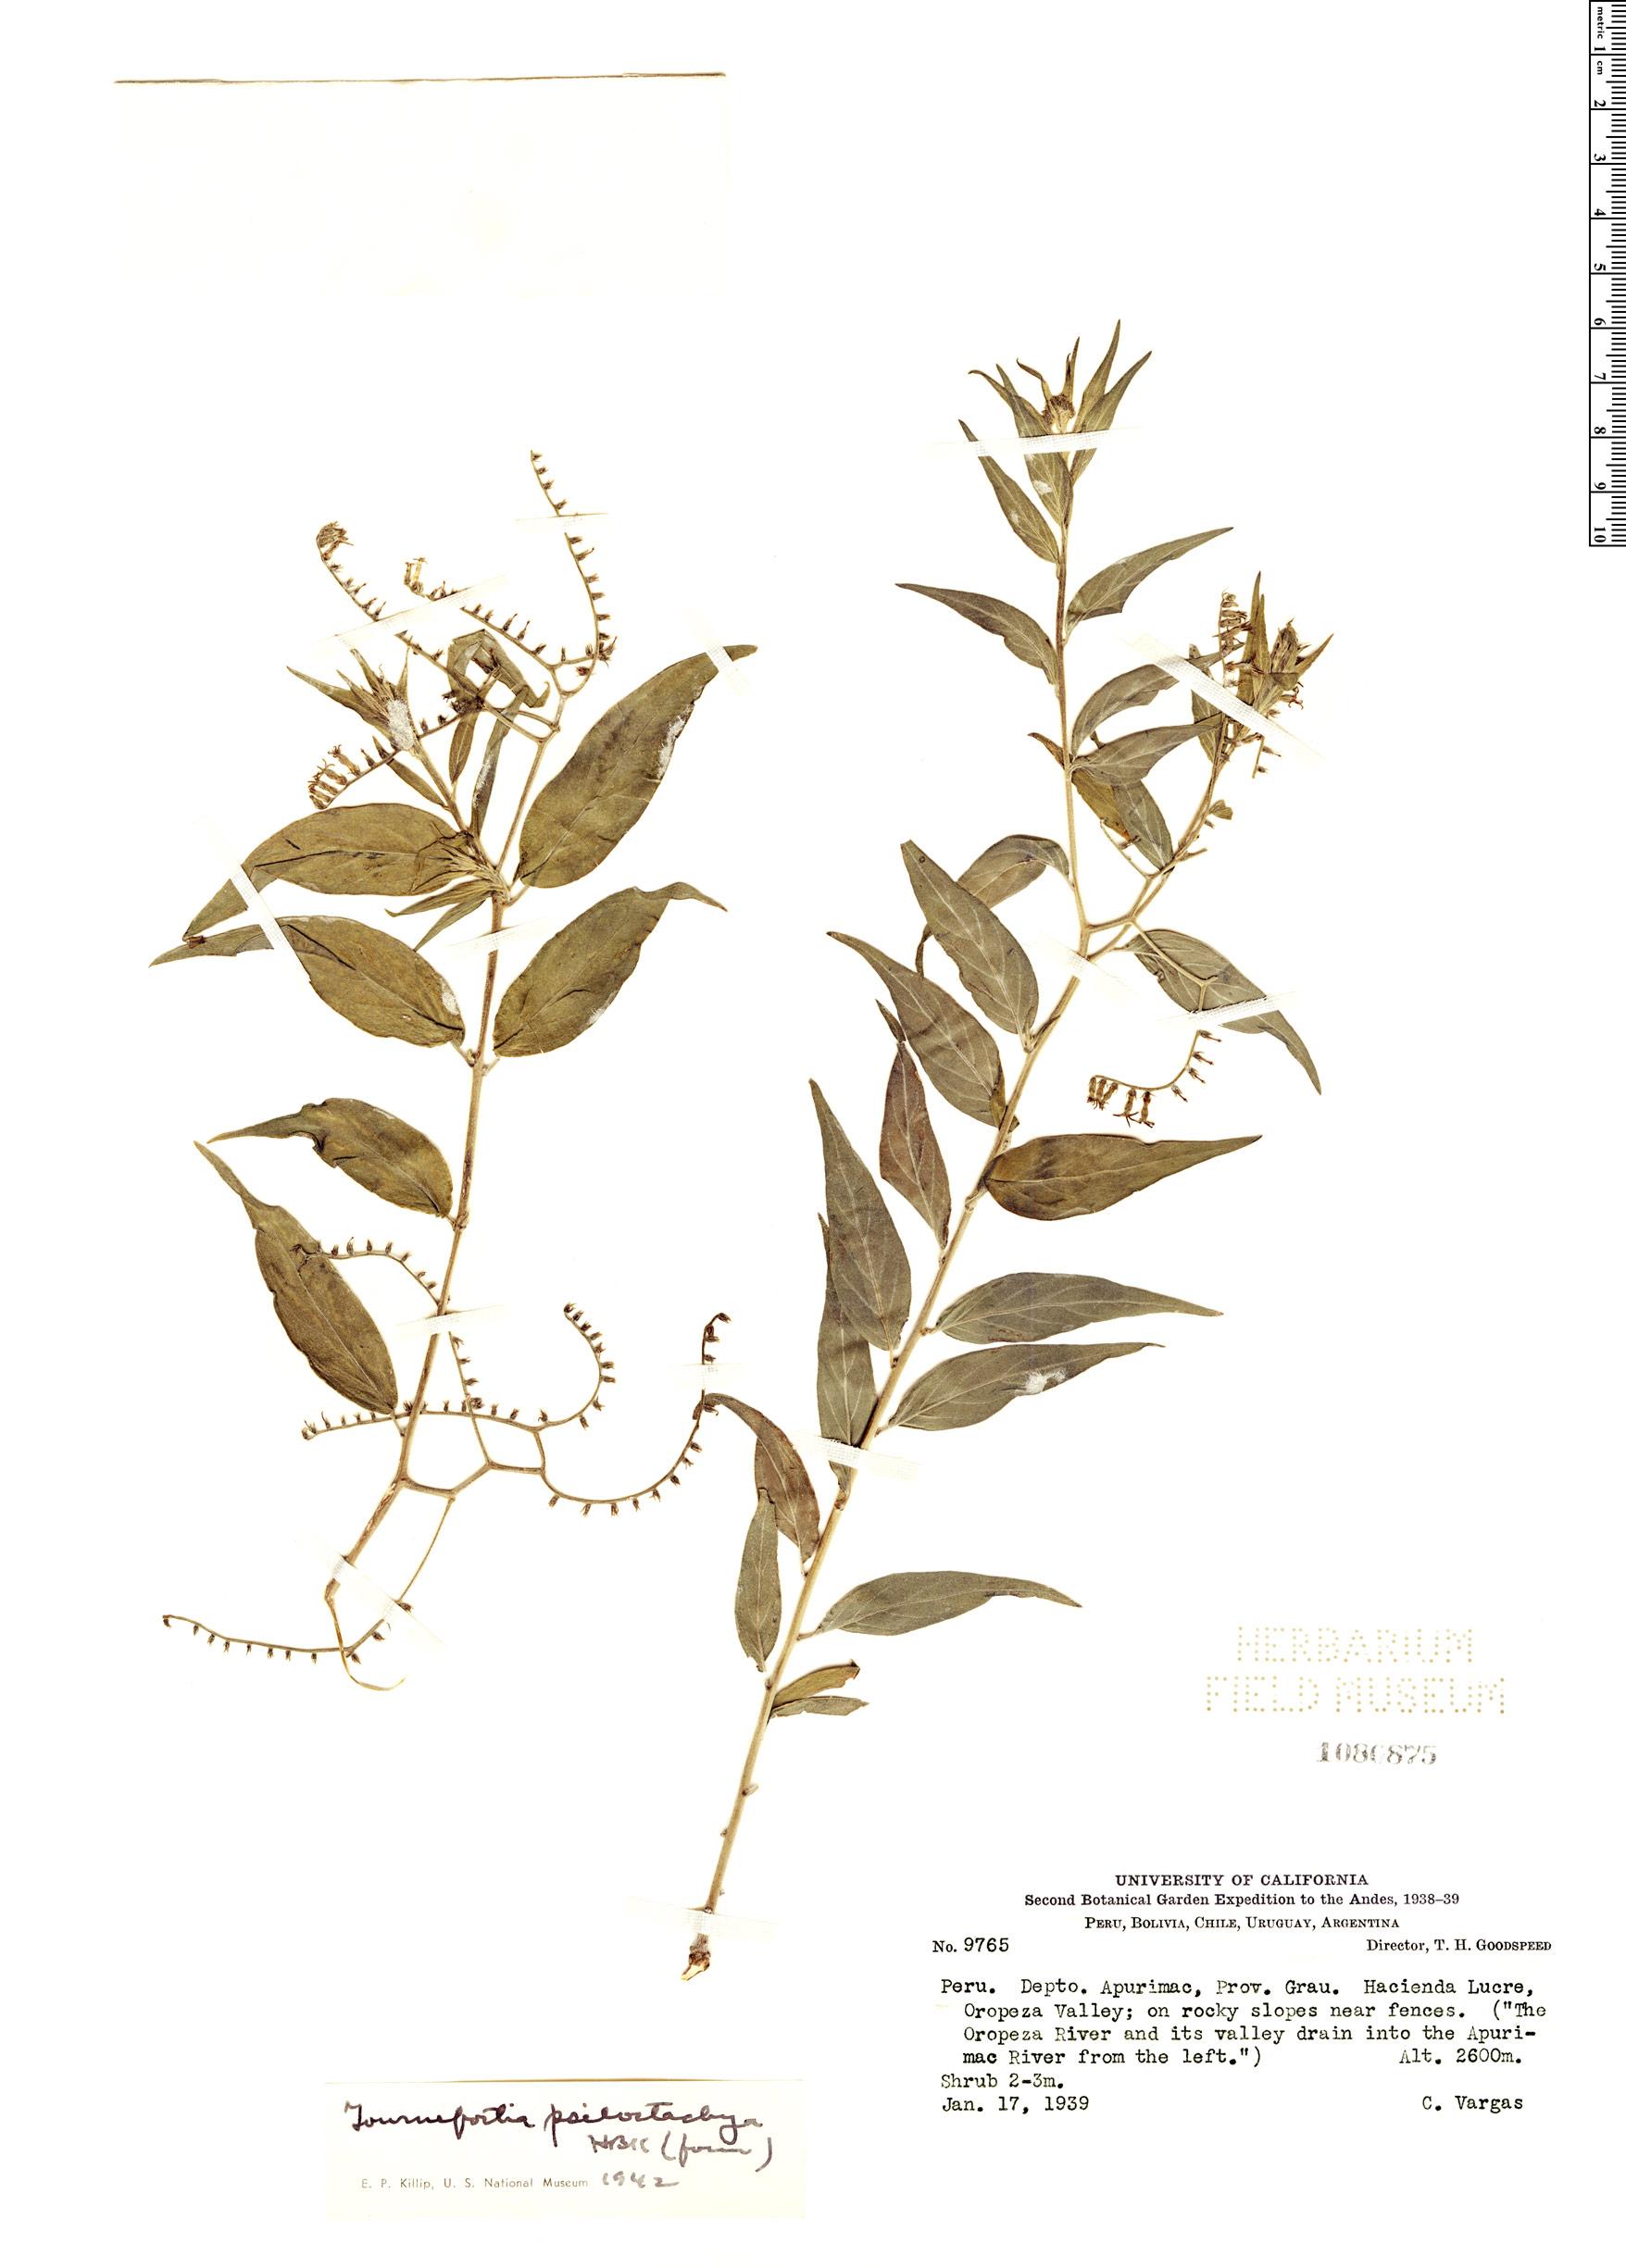 Specimen: Tournefortia psilostachya